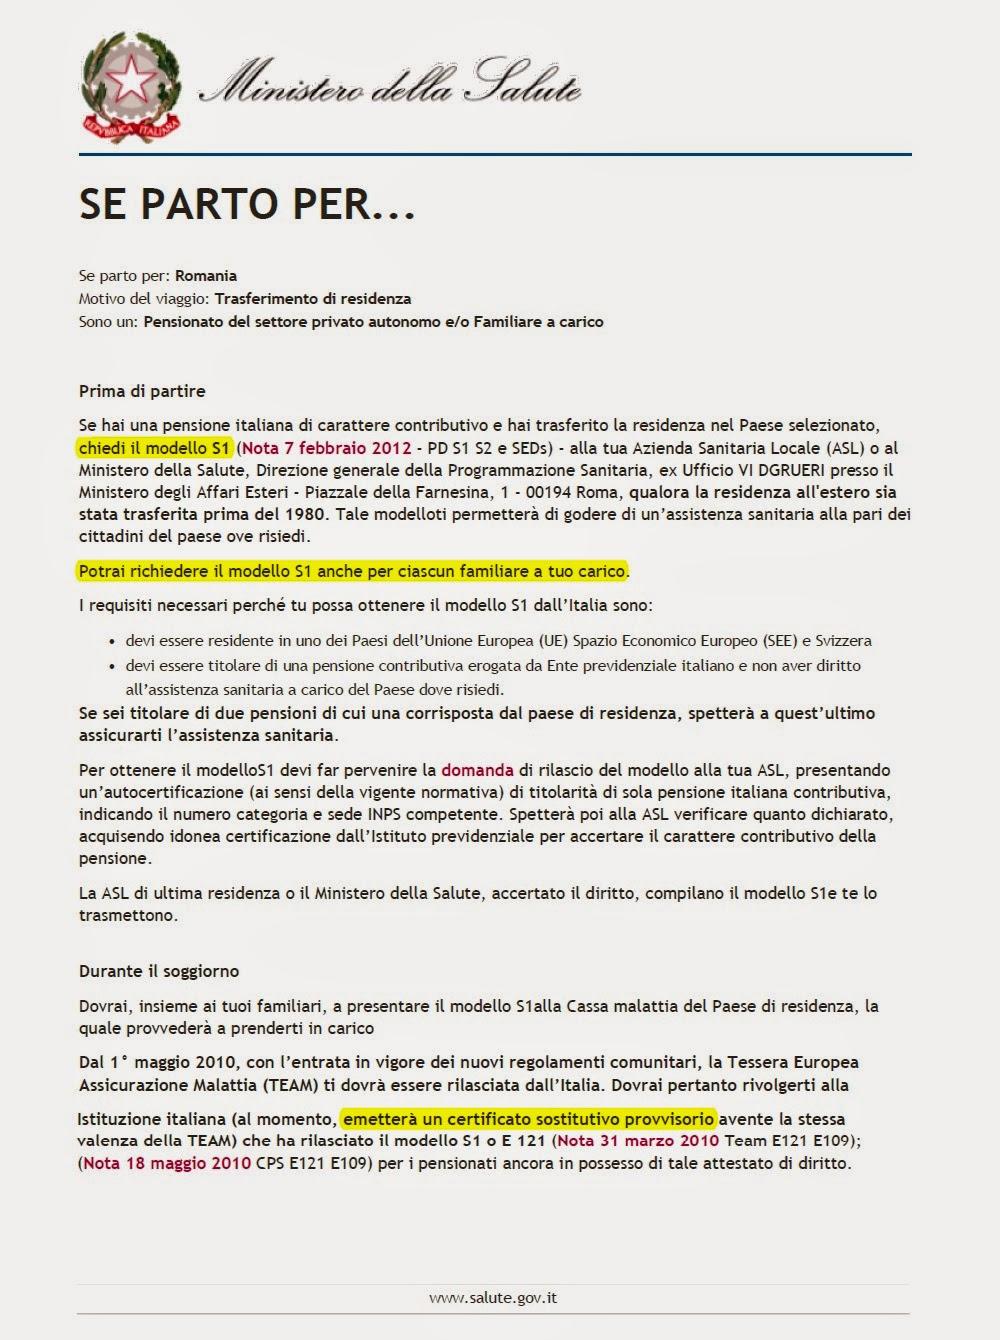 PENSII COMUNITARE / PENSIONI IN REGIME COMUNITARIO ...